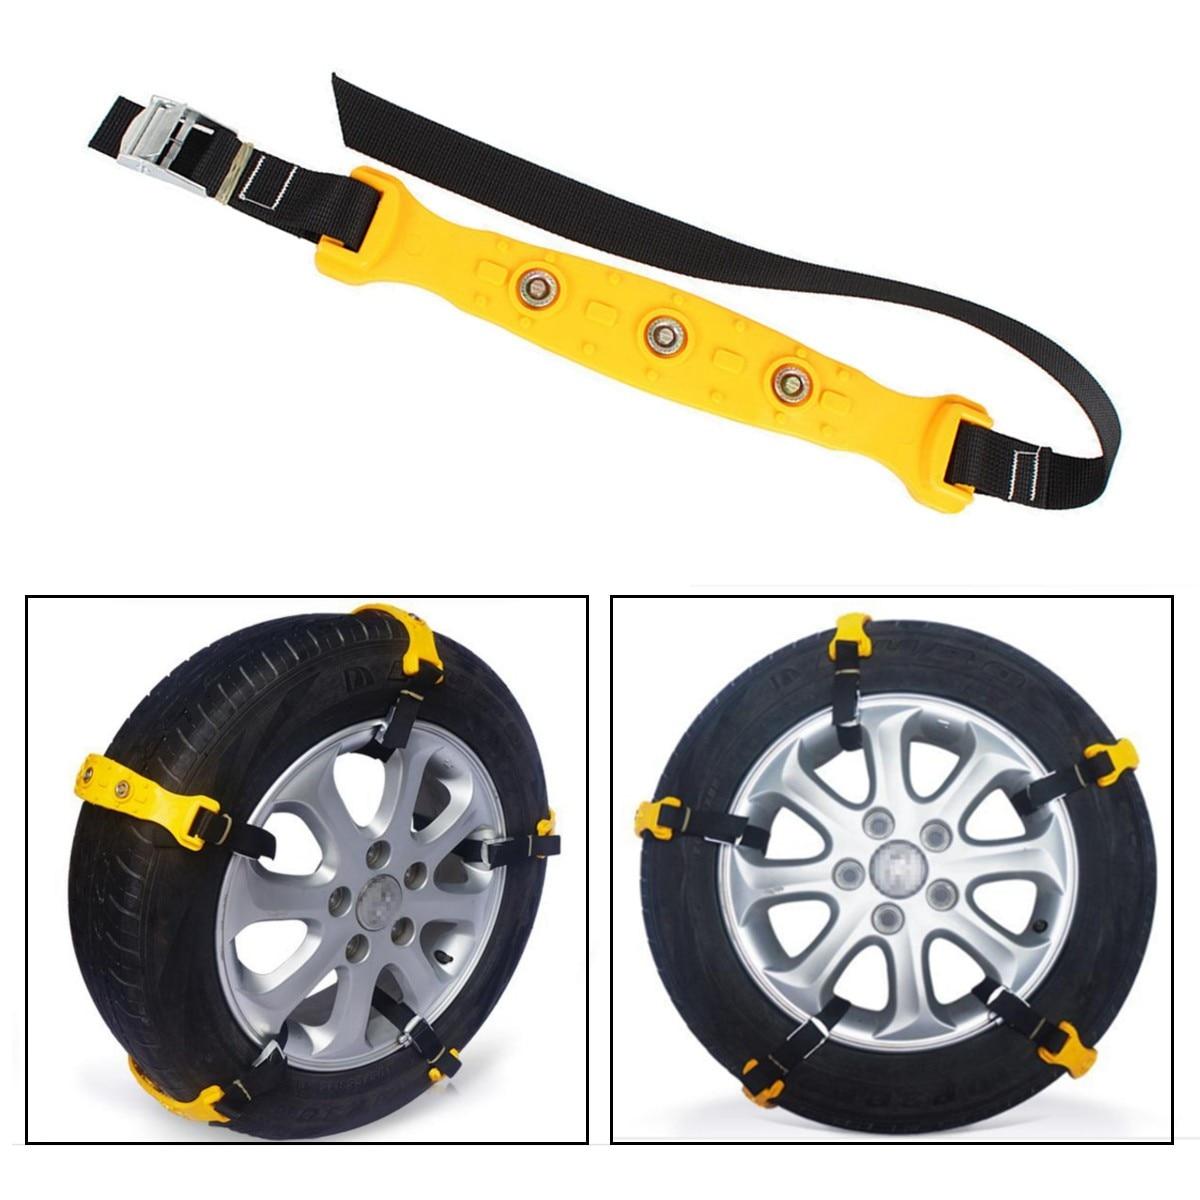 где купить  37 x 4.7cm 10pcs/set Car Yellow Tire Snow Chains Beef Tendon VAN Wheel Tyre Anti-skid TPU Chains  по лучшей цене